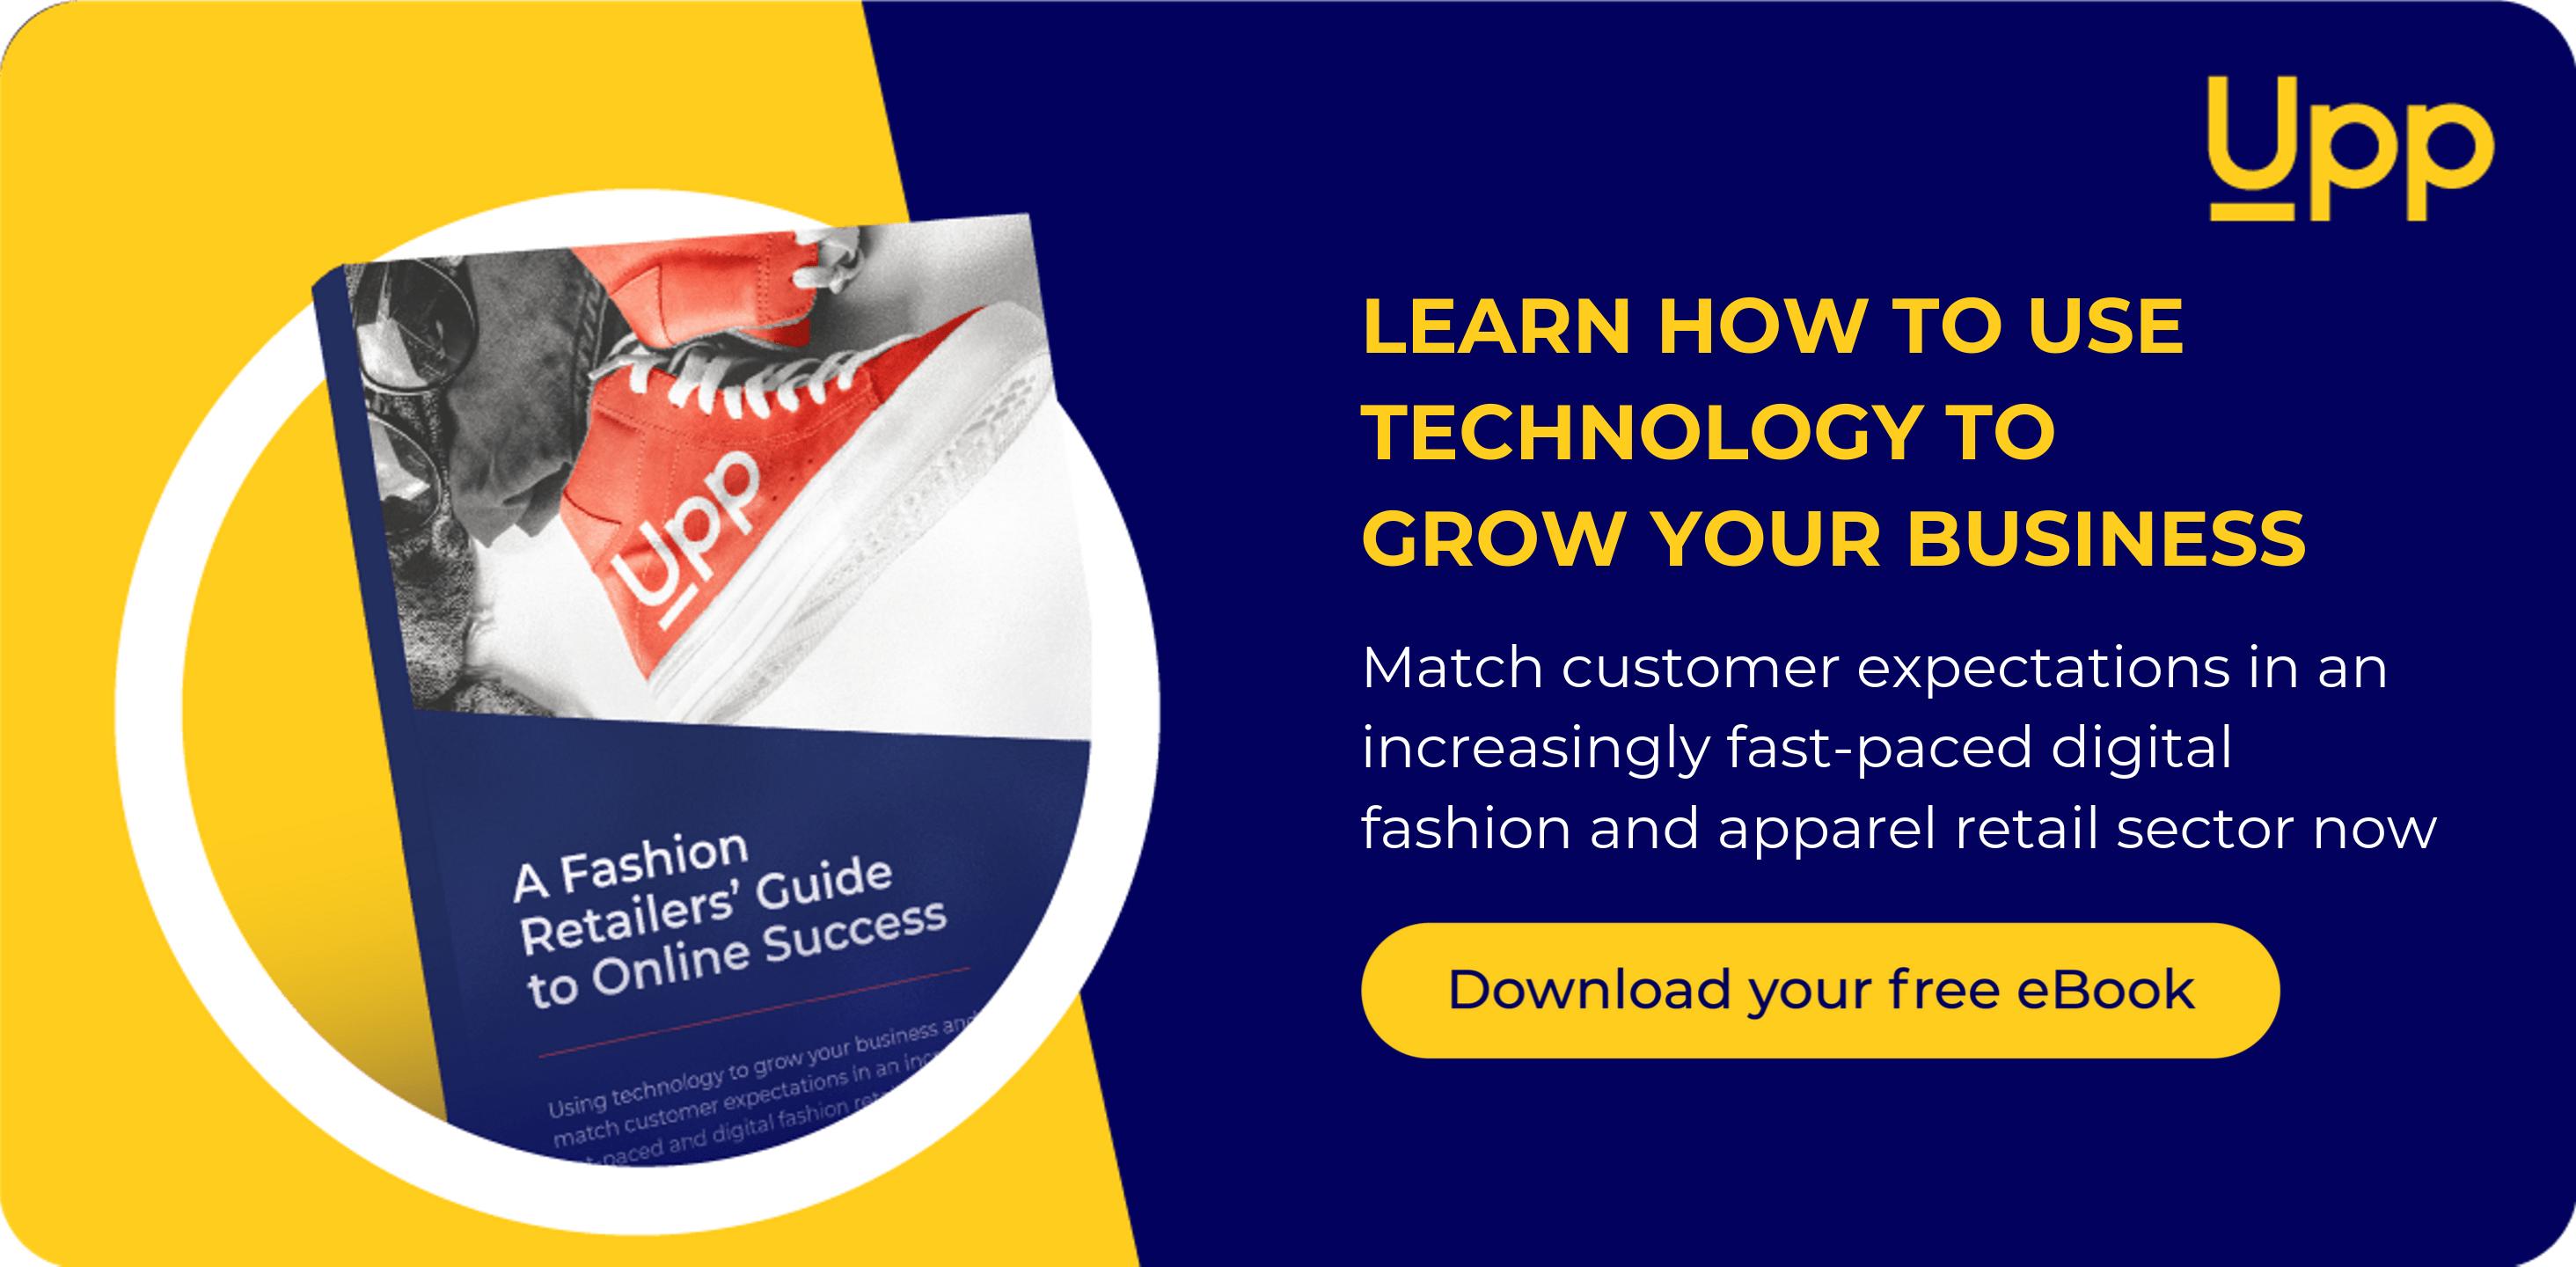 fashion retailers' success guide